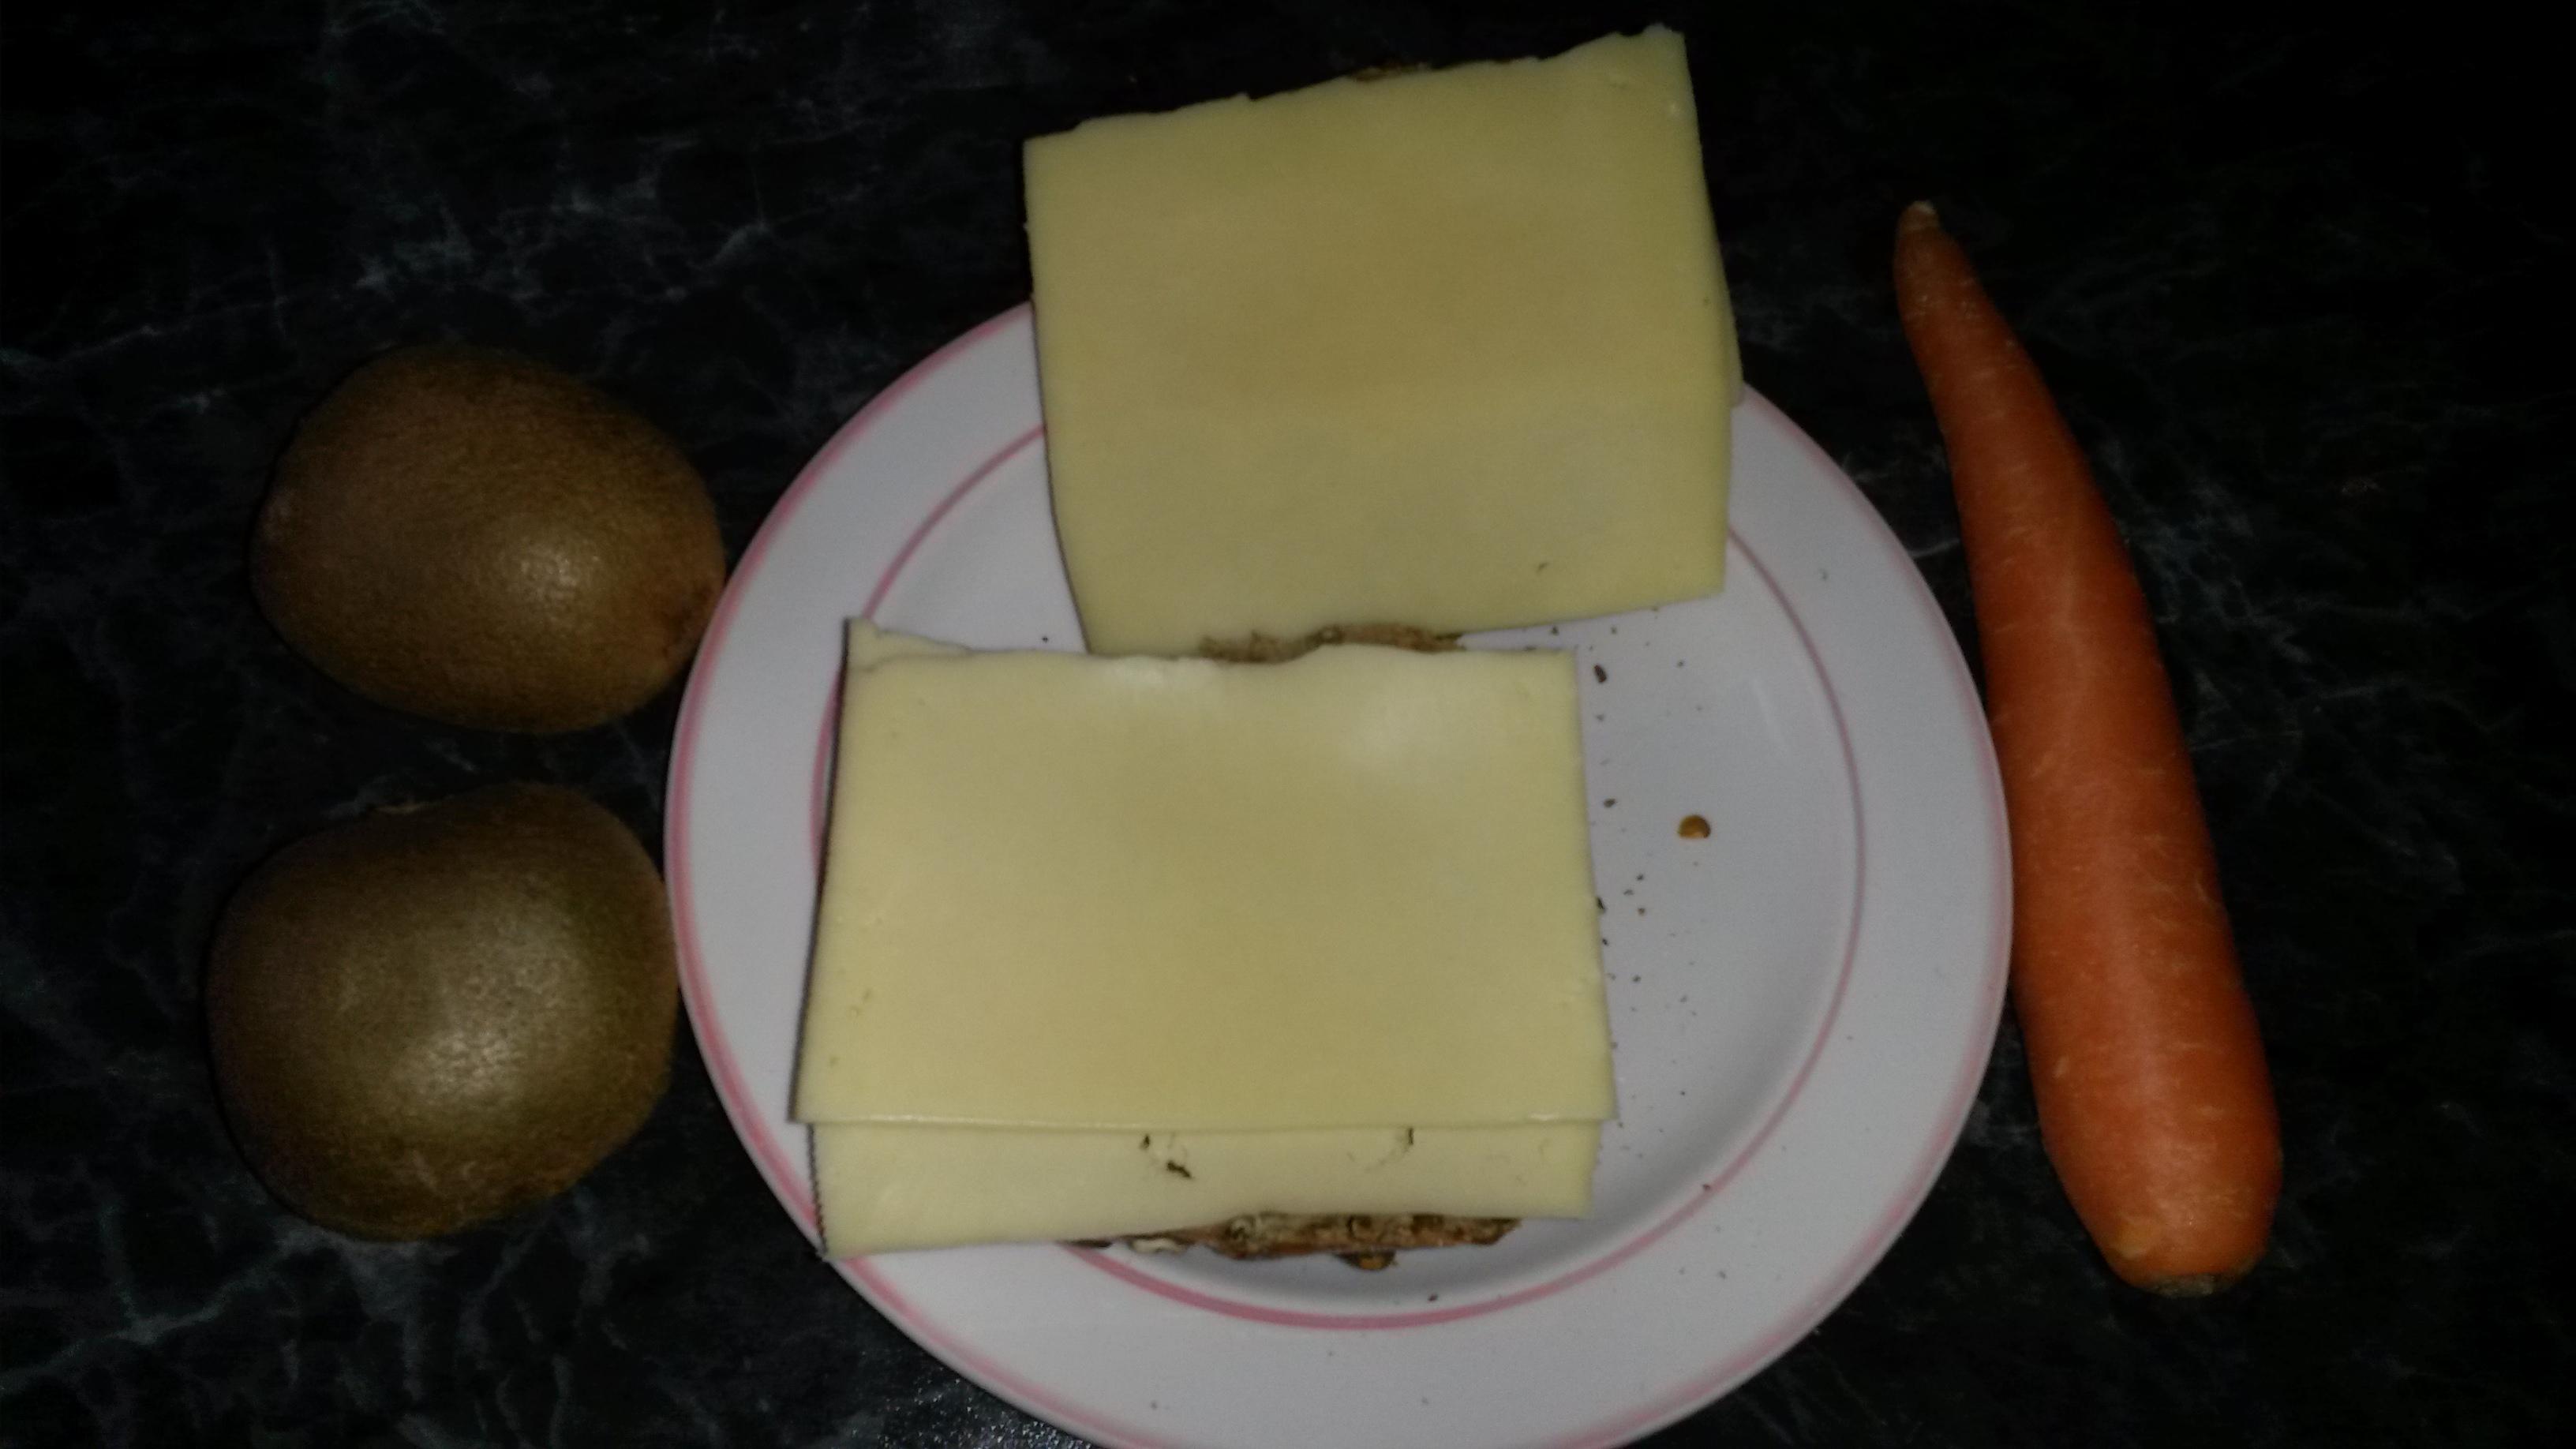 http://foodloader.net/sk0r_2014-05-16_Kaesebroetchen_Karotte_Kiwis.jpg